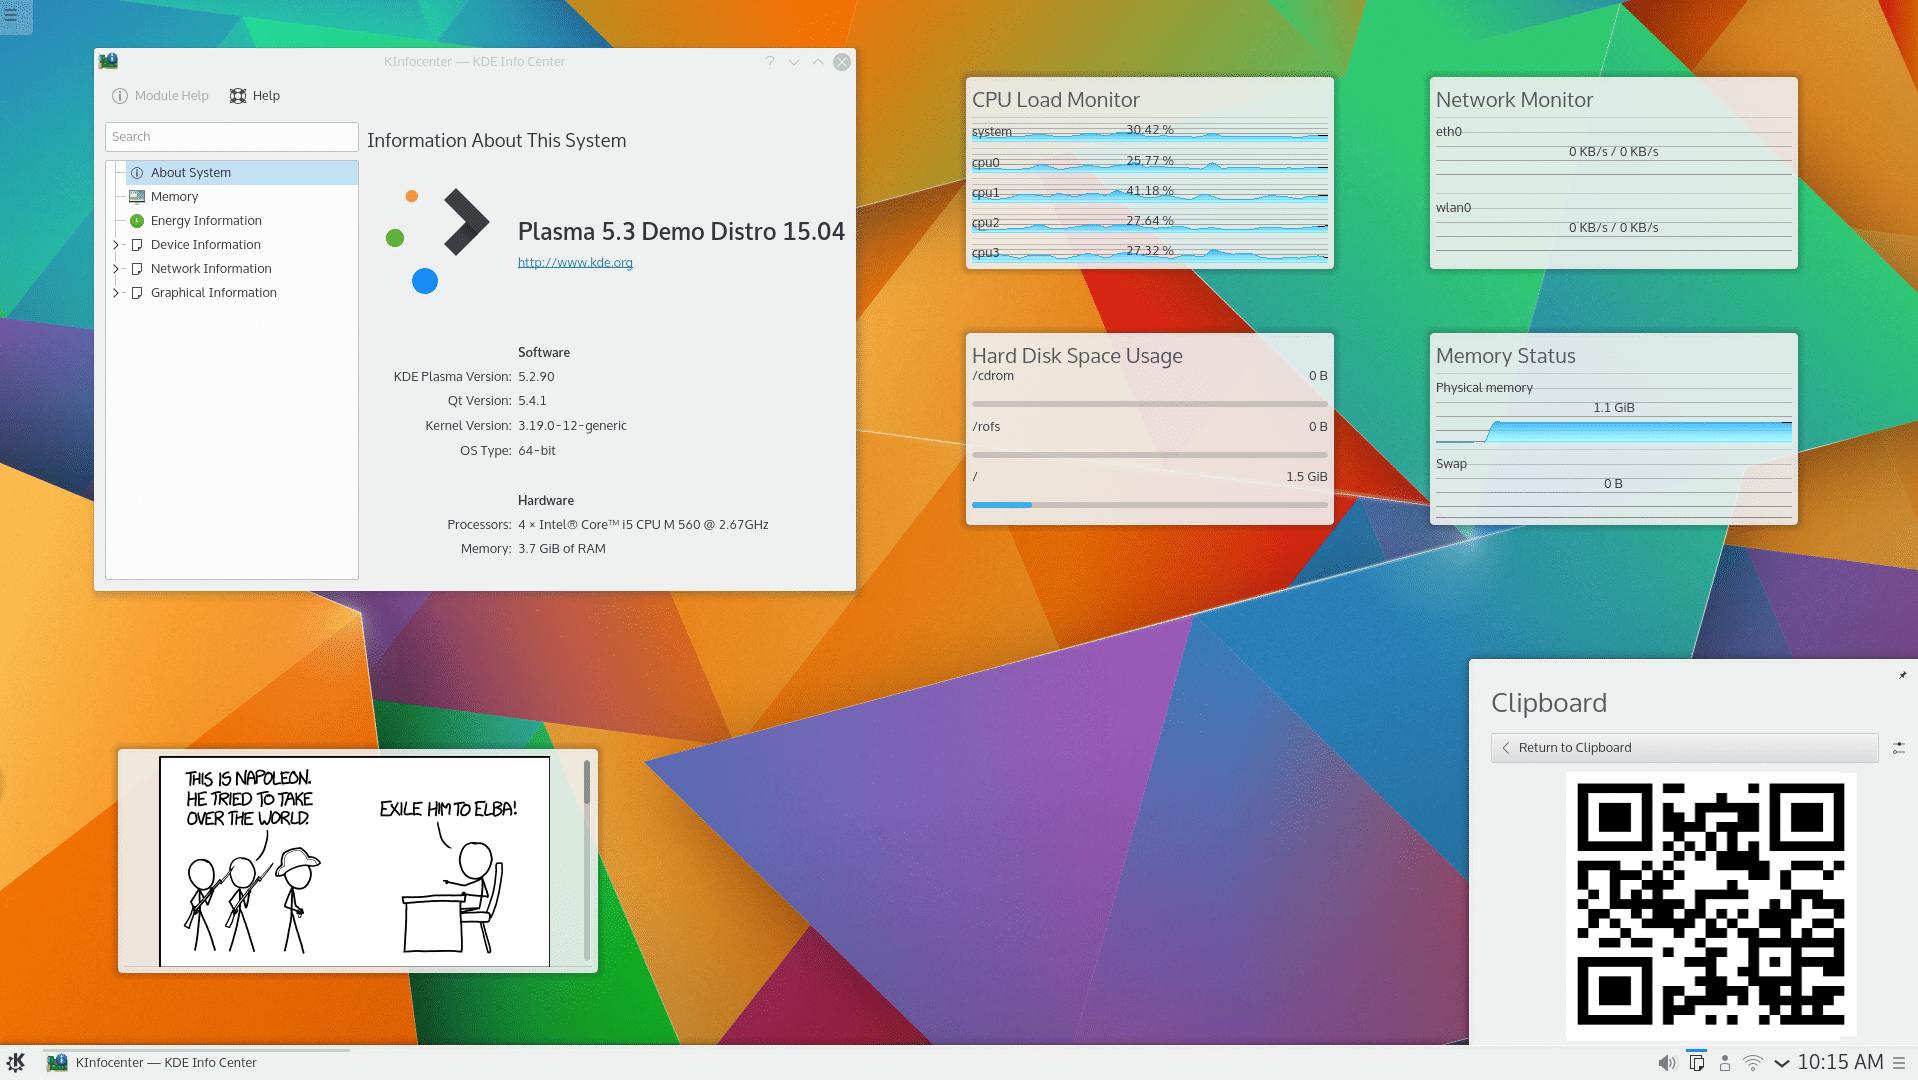 KDE-5.3-fedorafans.com